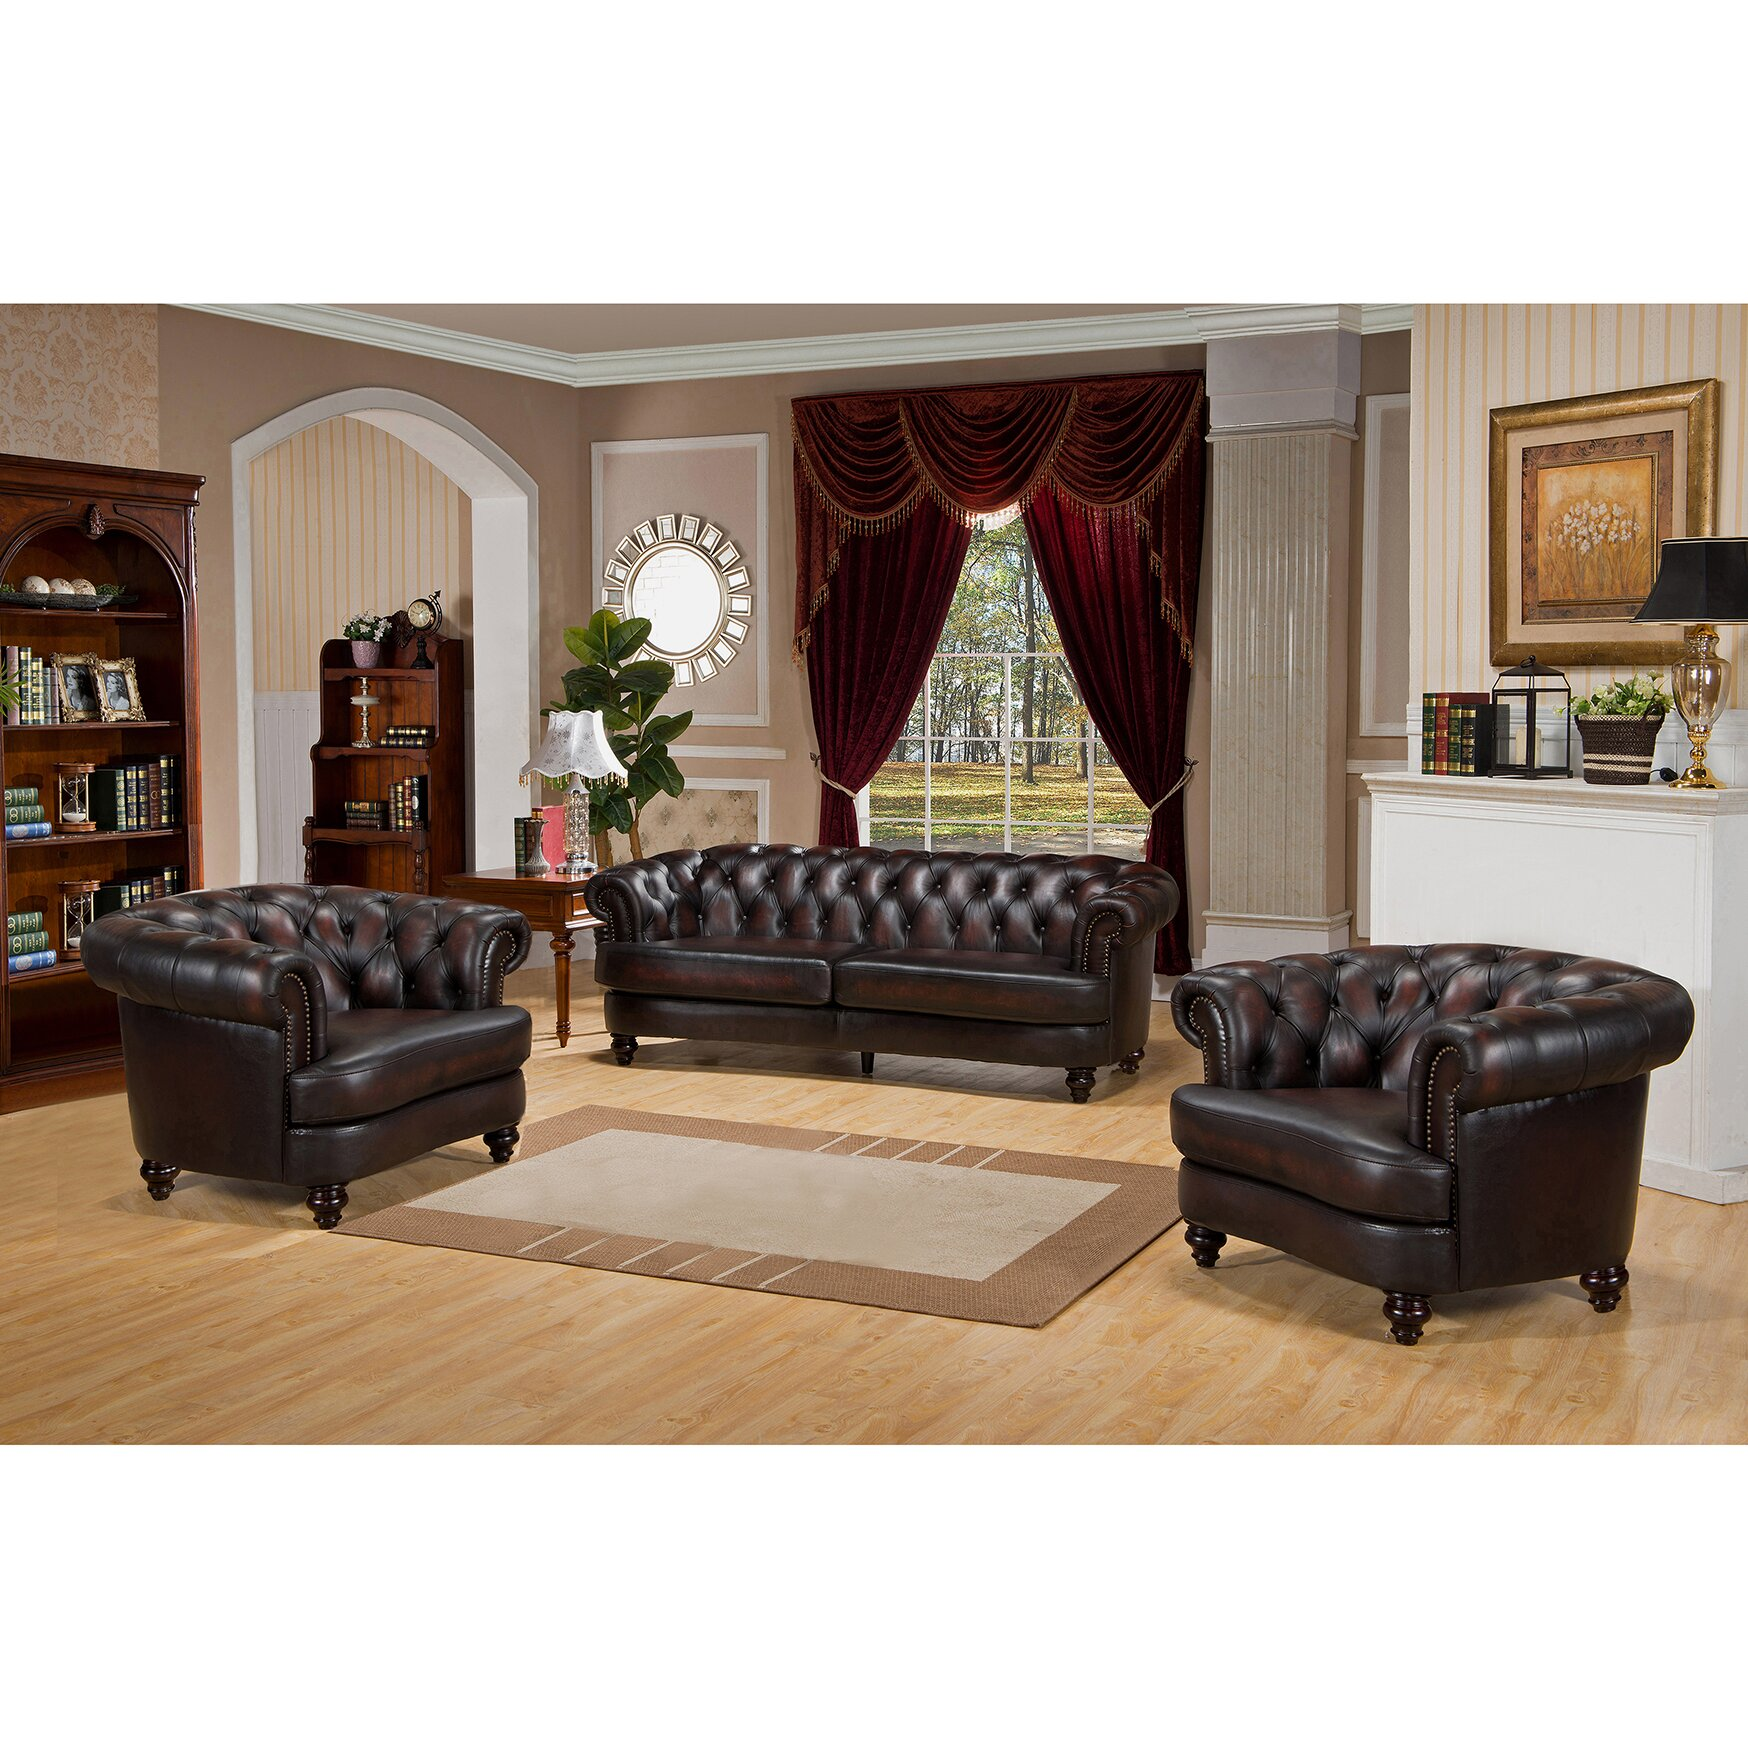 Amax Roosevelt 3 Piece Leather Living Room Set